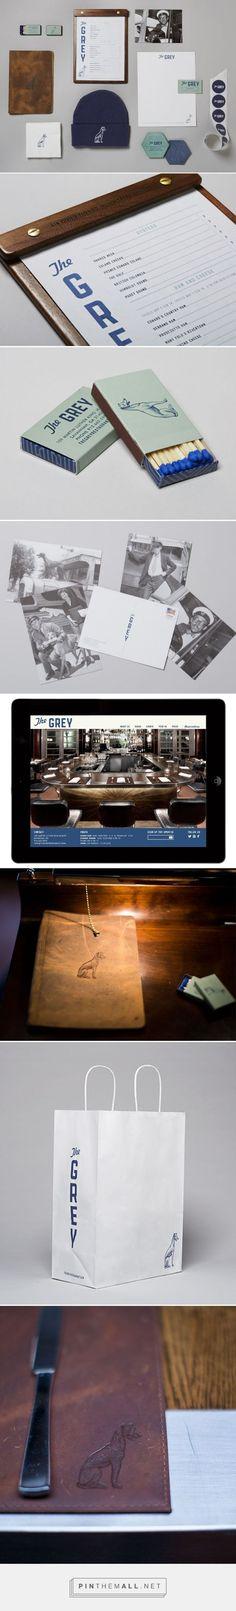 The Grey Restaurant Branding by LMNOP Creative   Fivestar Branding – Design and Branding Agency & Inspiration Gallery